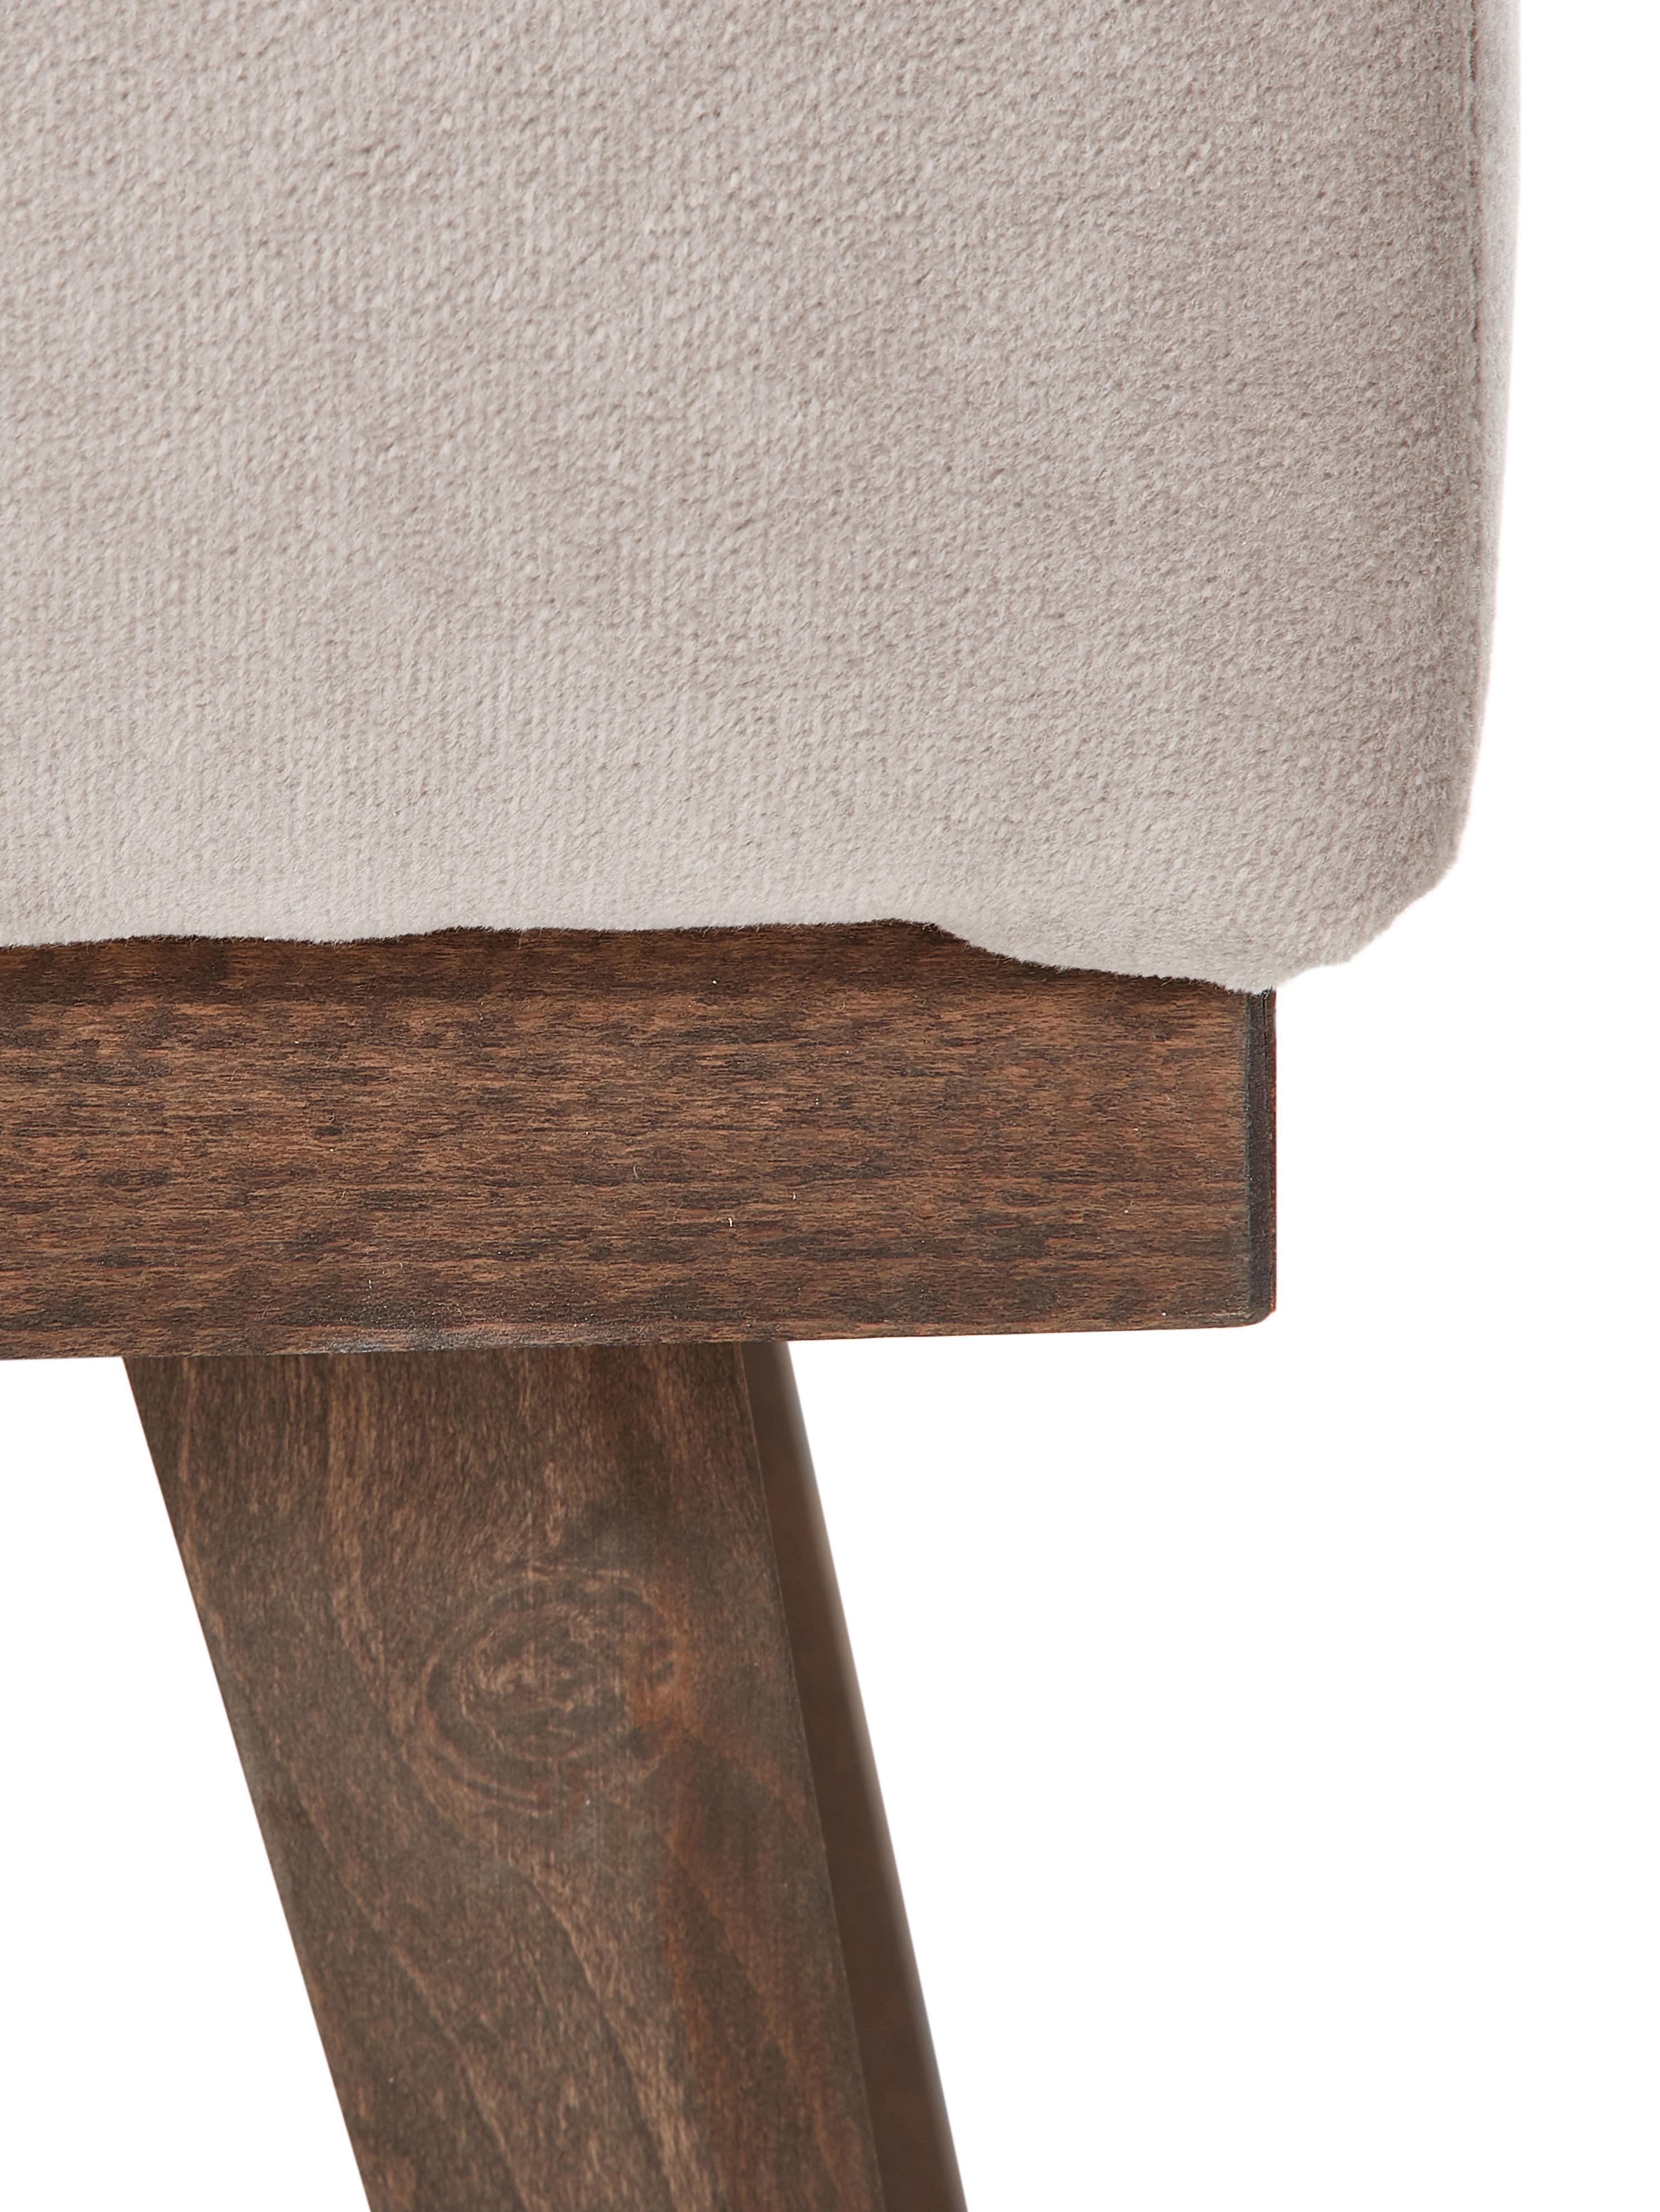 Sofa-Hocker Alva aus Samt, Bezug: Samt (Hochwertiger Polyes, Gestell: Massives Kiefernholz, Füße: Massives Buchenholz, gebe, Taupe, 74 x 30 cm